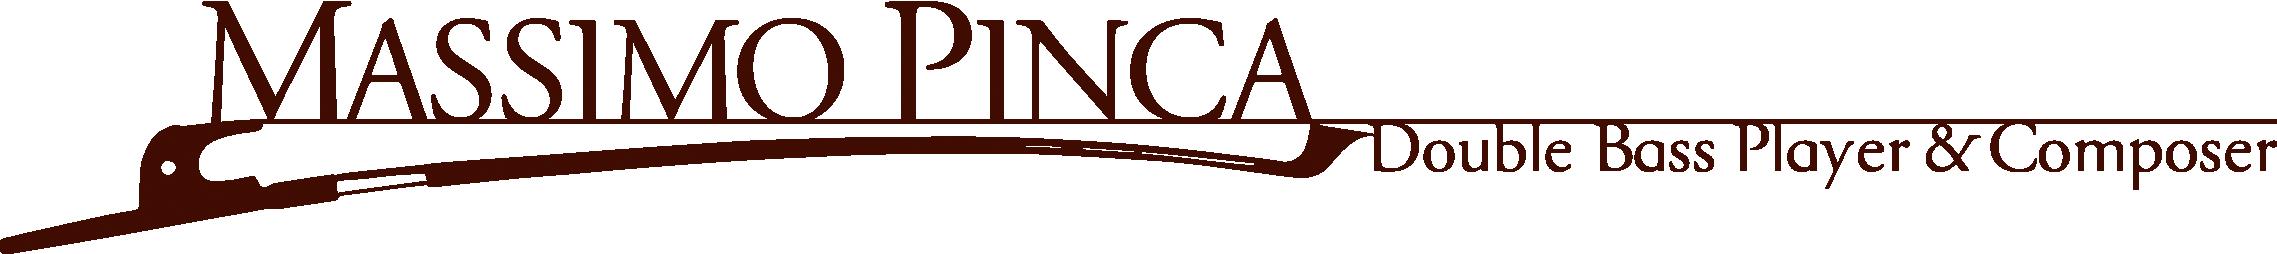 Massimo Pinca